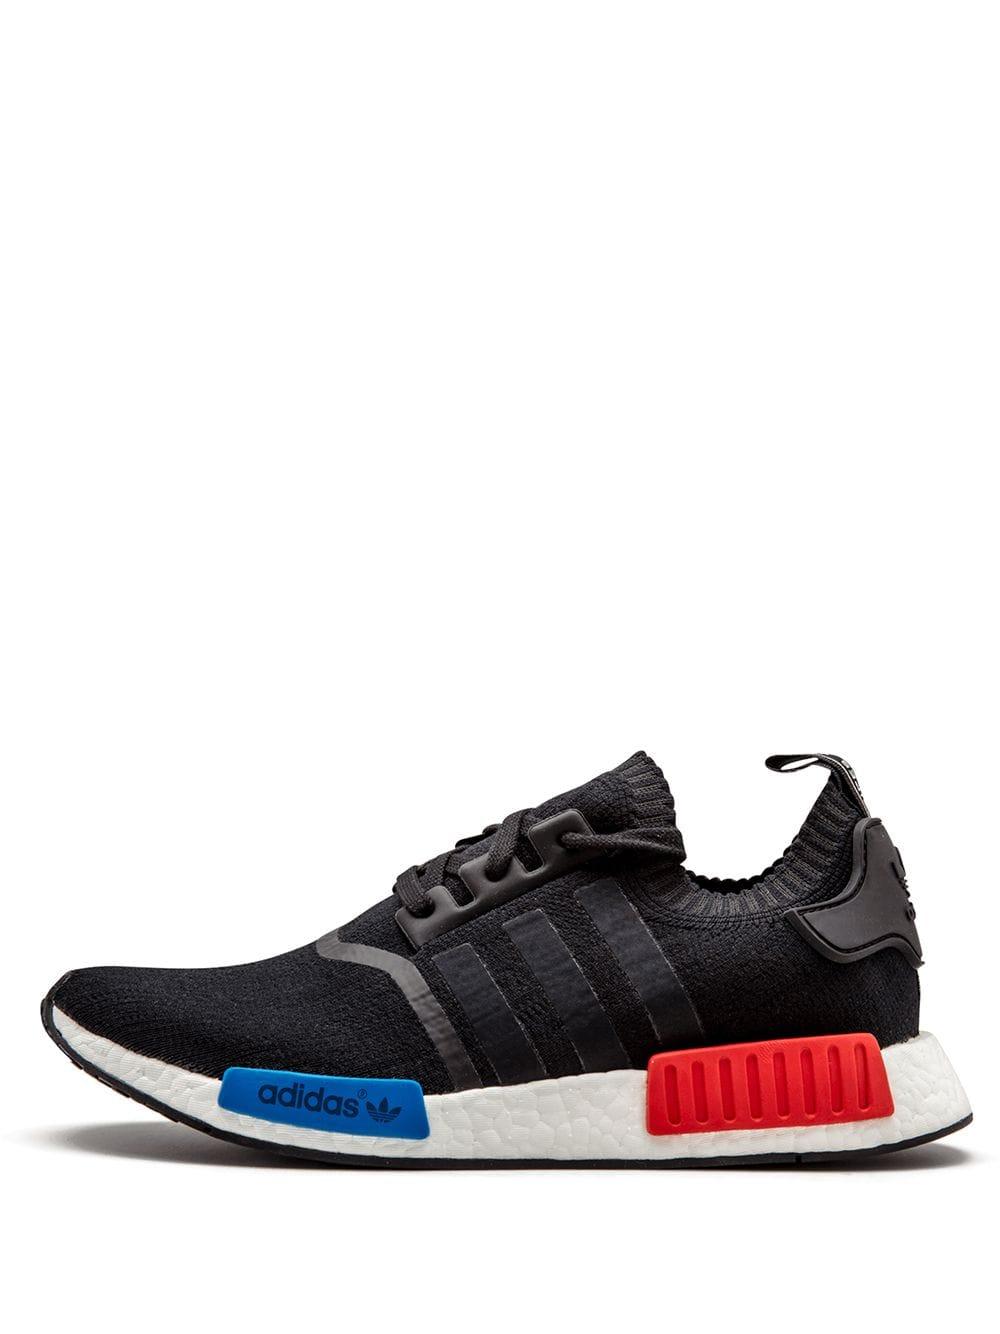 adidas Originals NMD sneakers | Rare